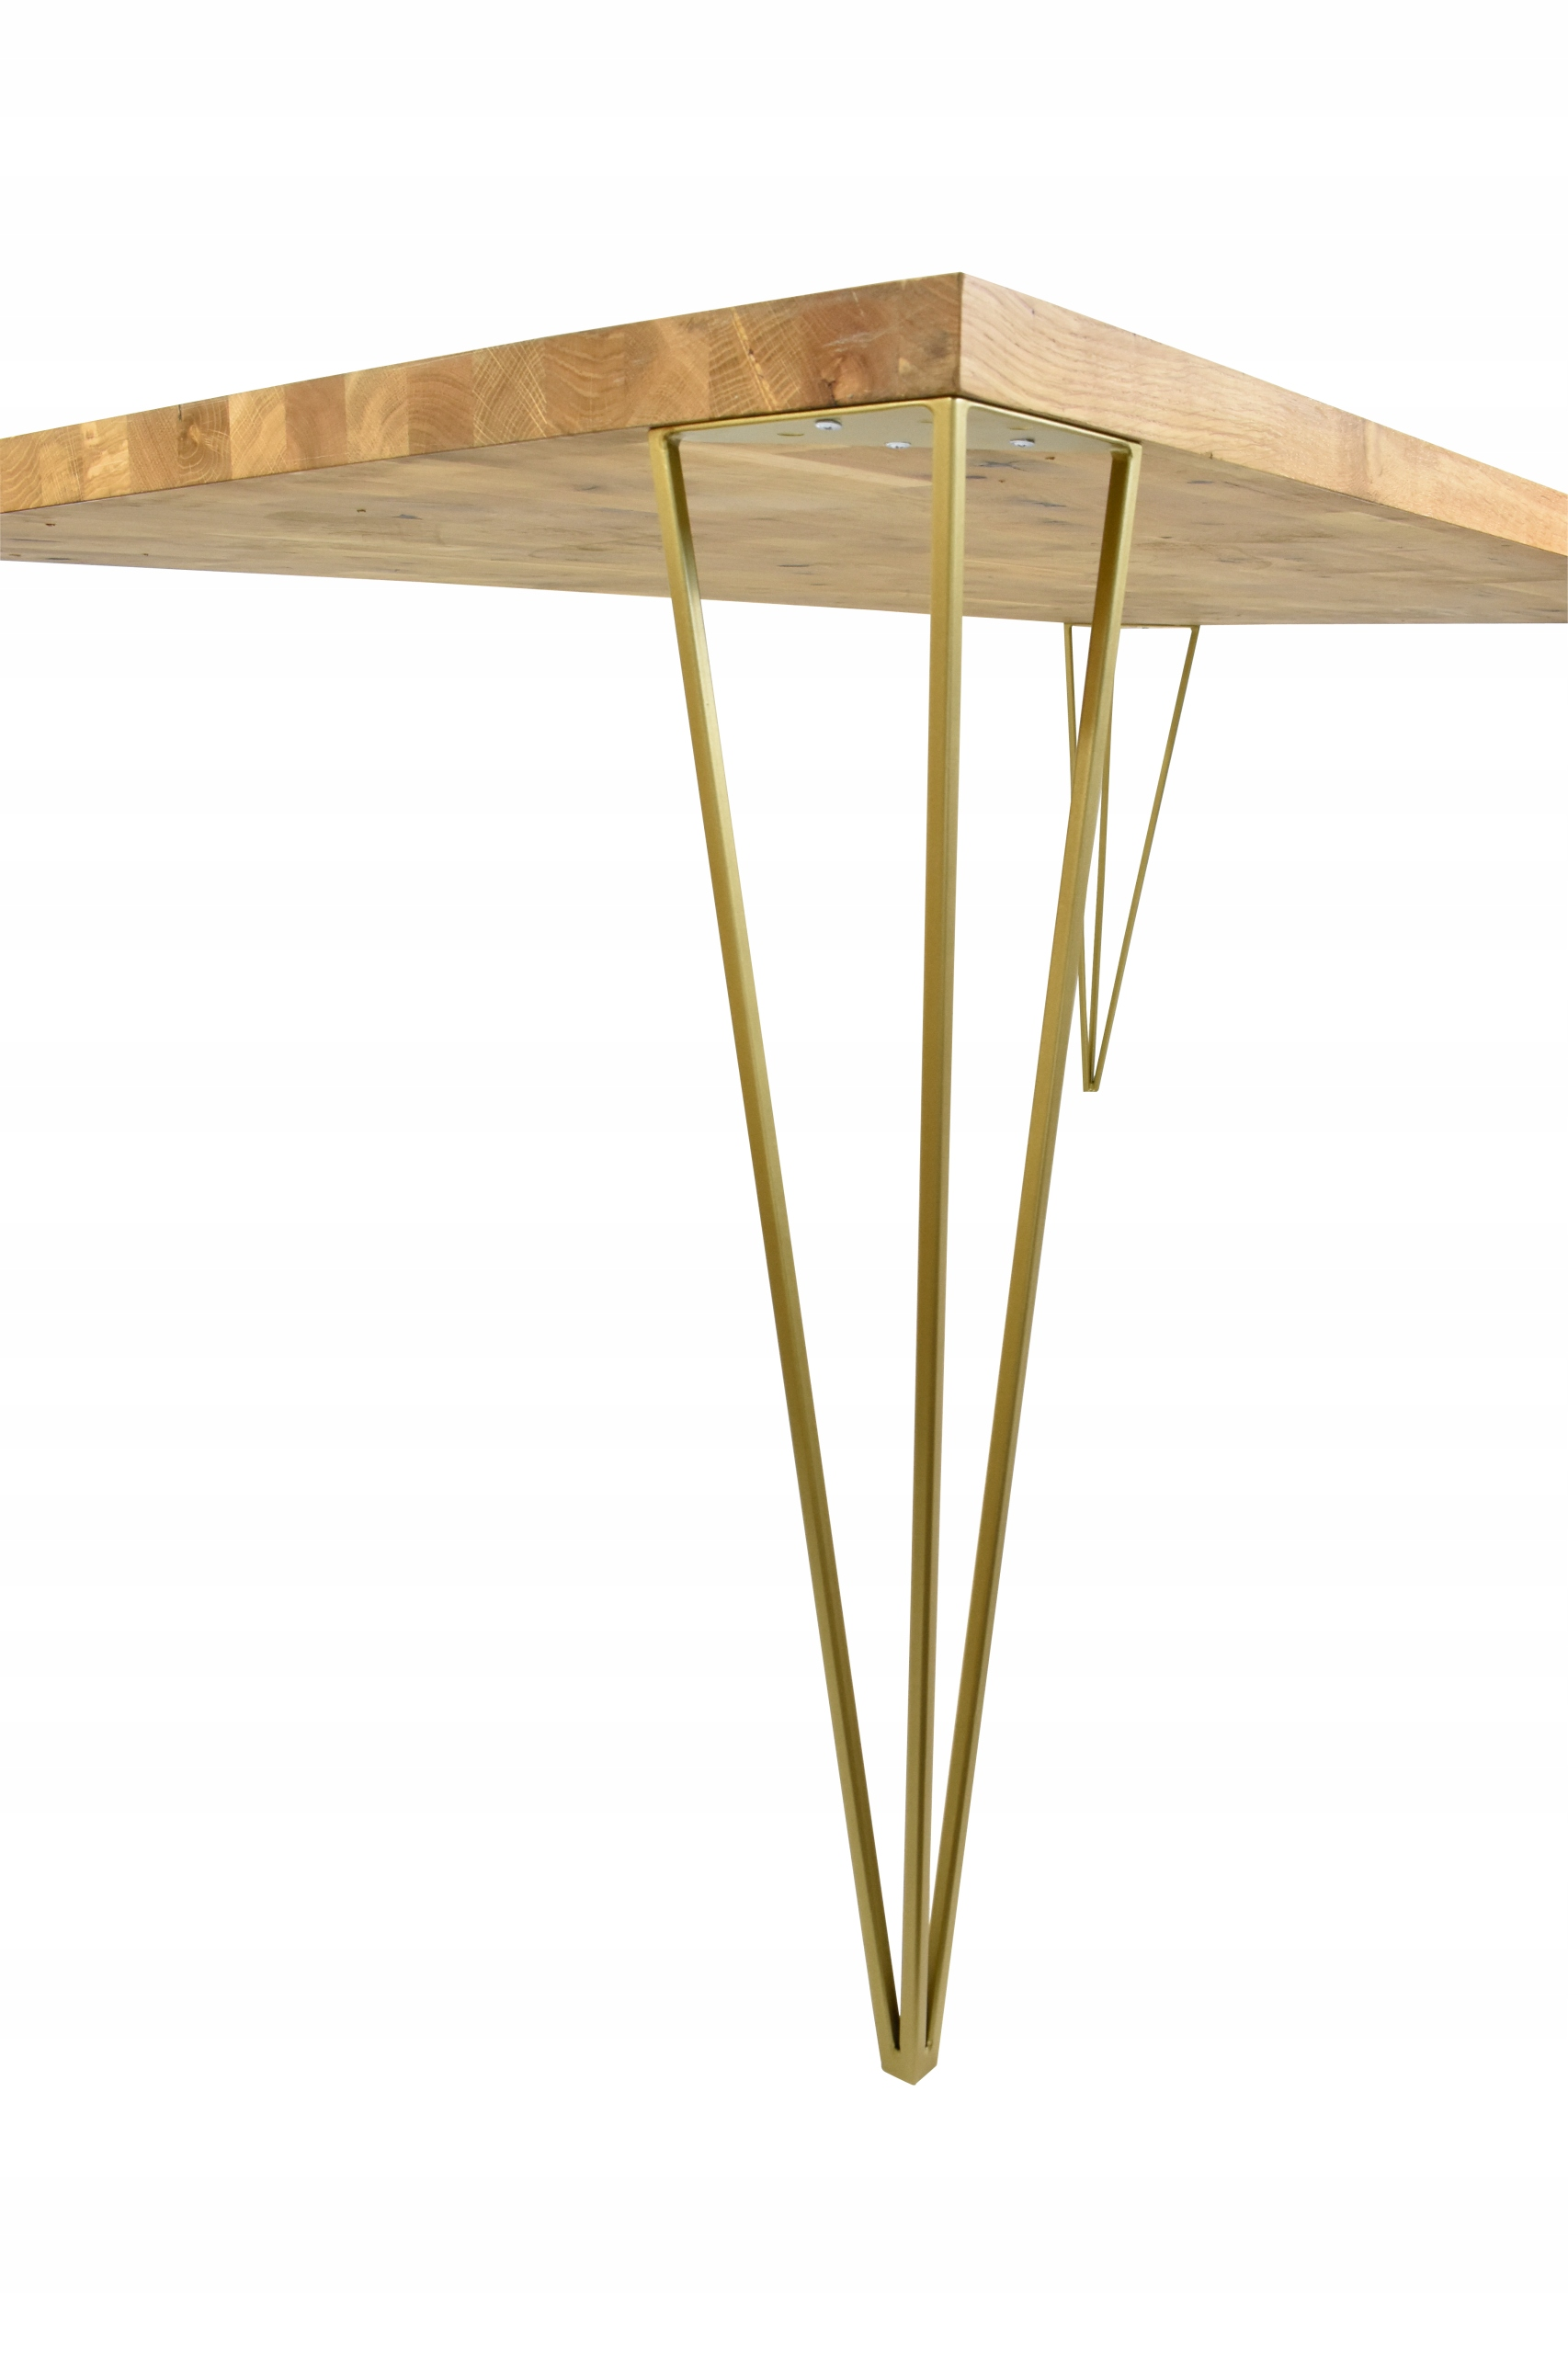 Nogi metalowe do biurka Loft Industria No14 złota